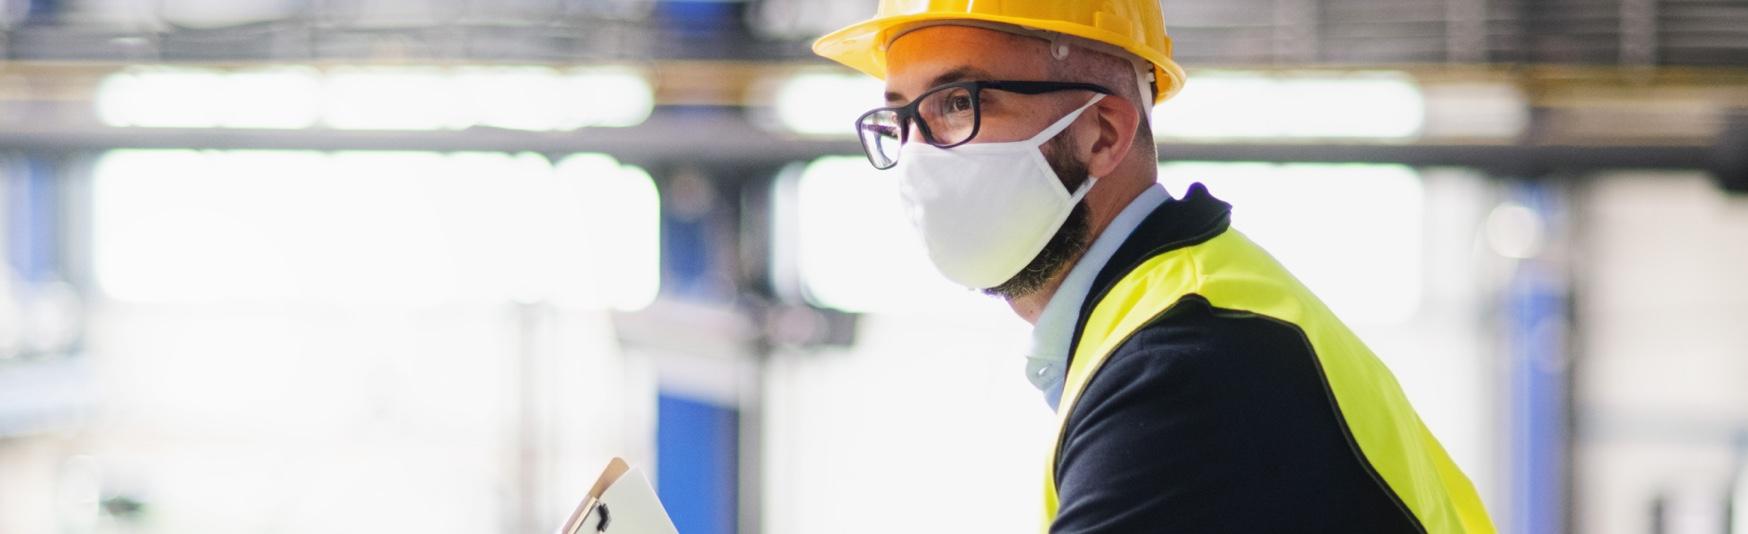 LP_Header-1748x534-man-construction-mask-manufacturing-safety